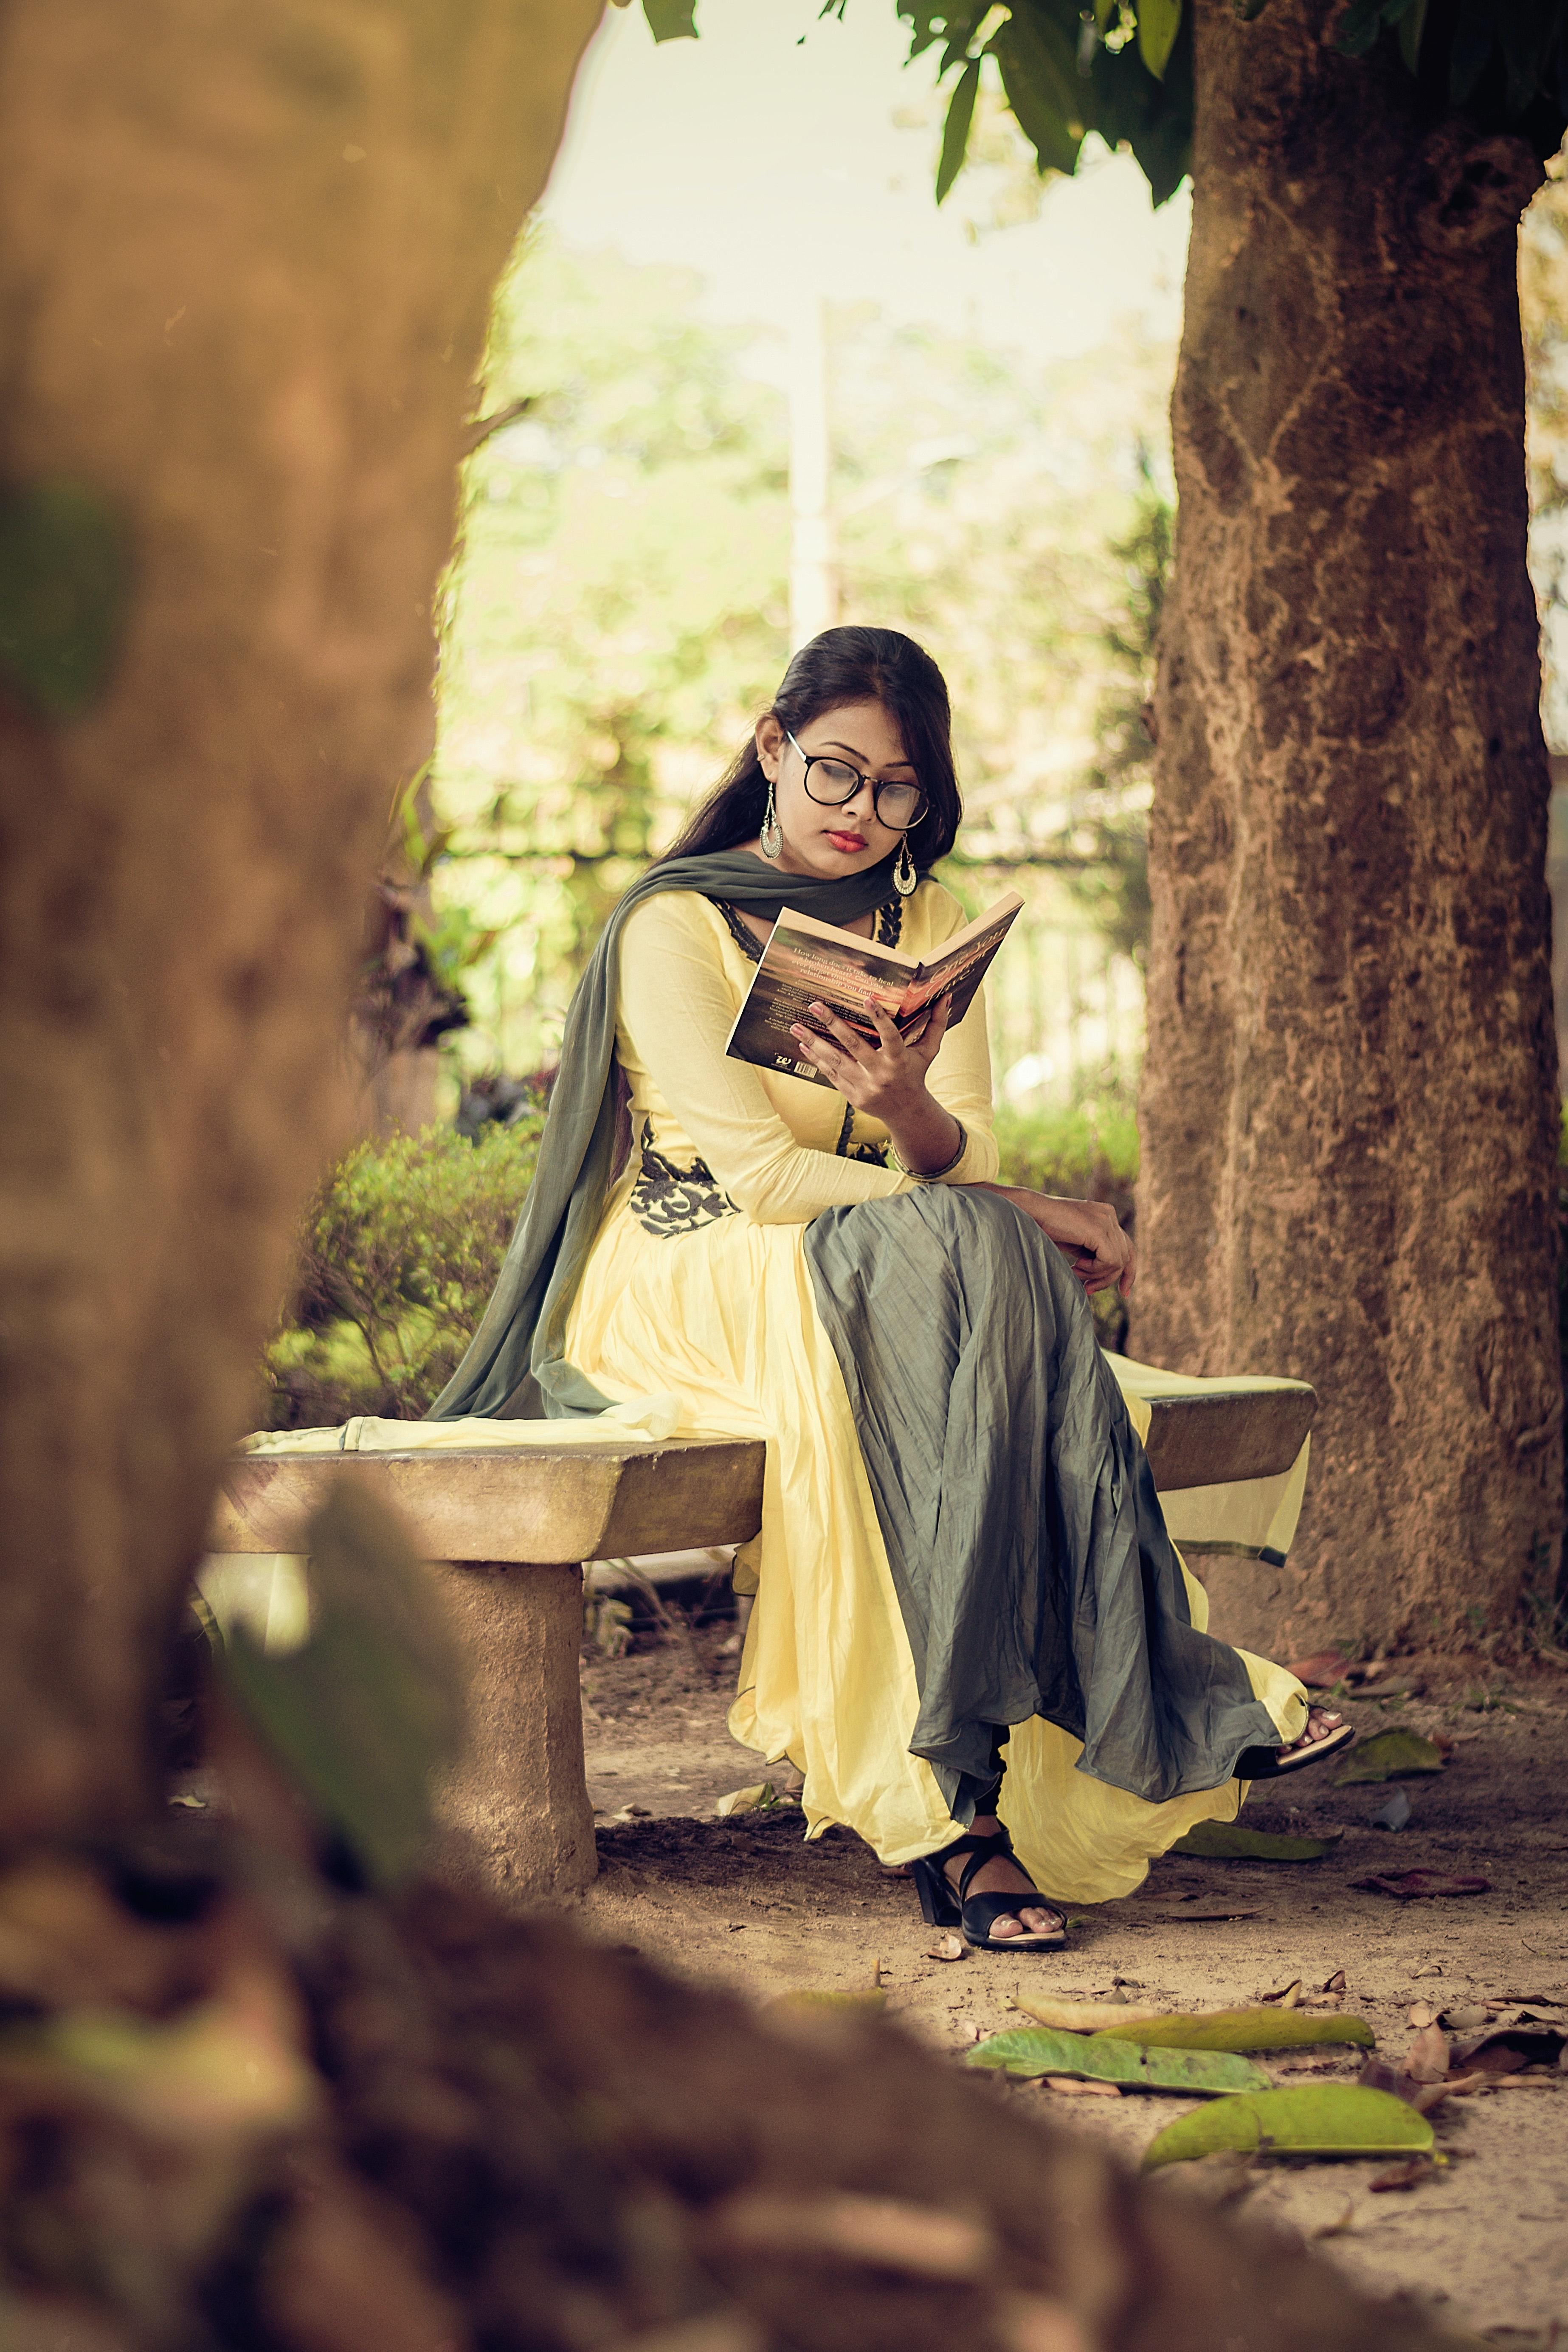 woman-reading-book-1580272.jpg